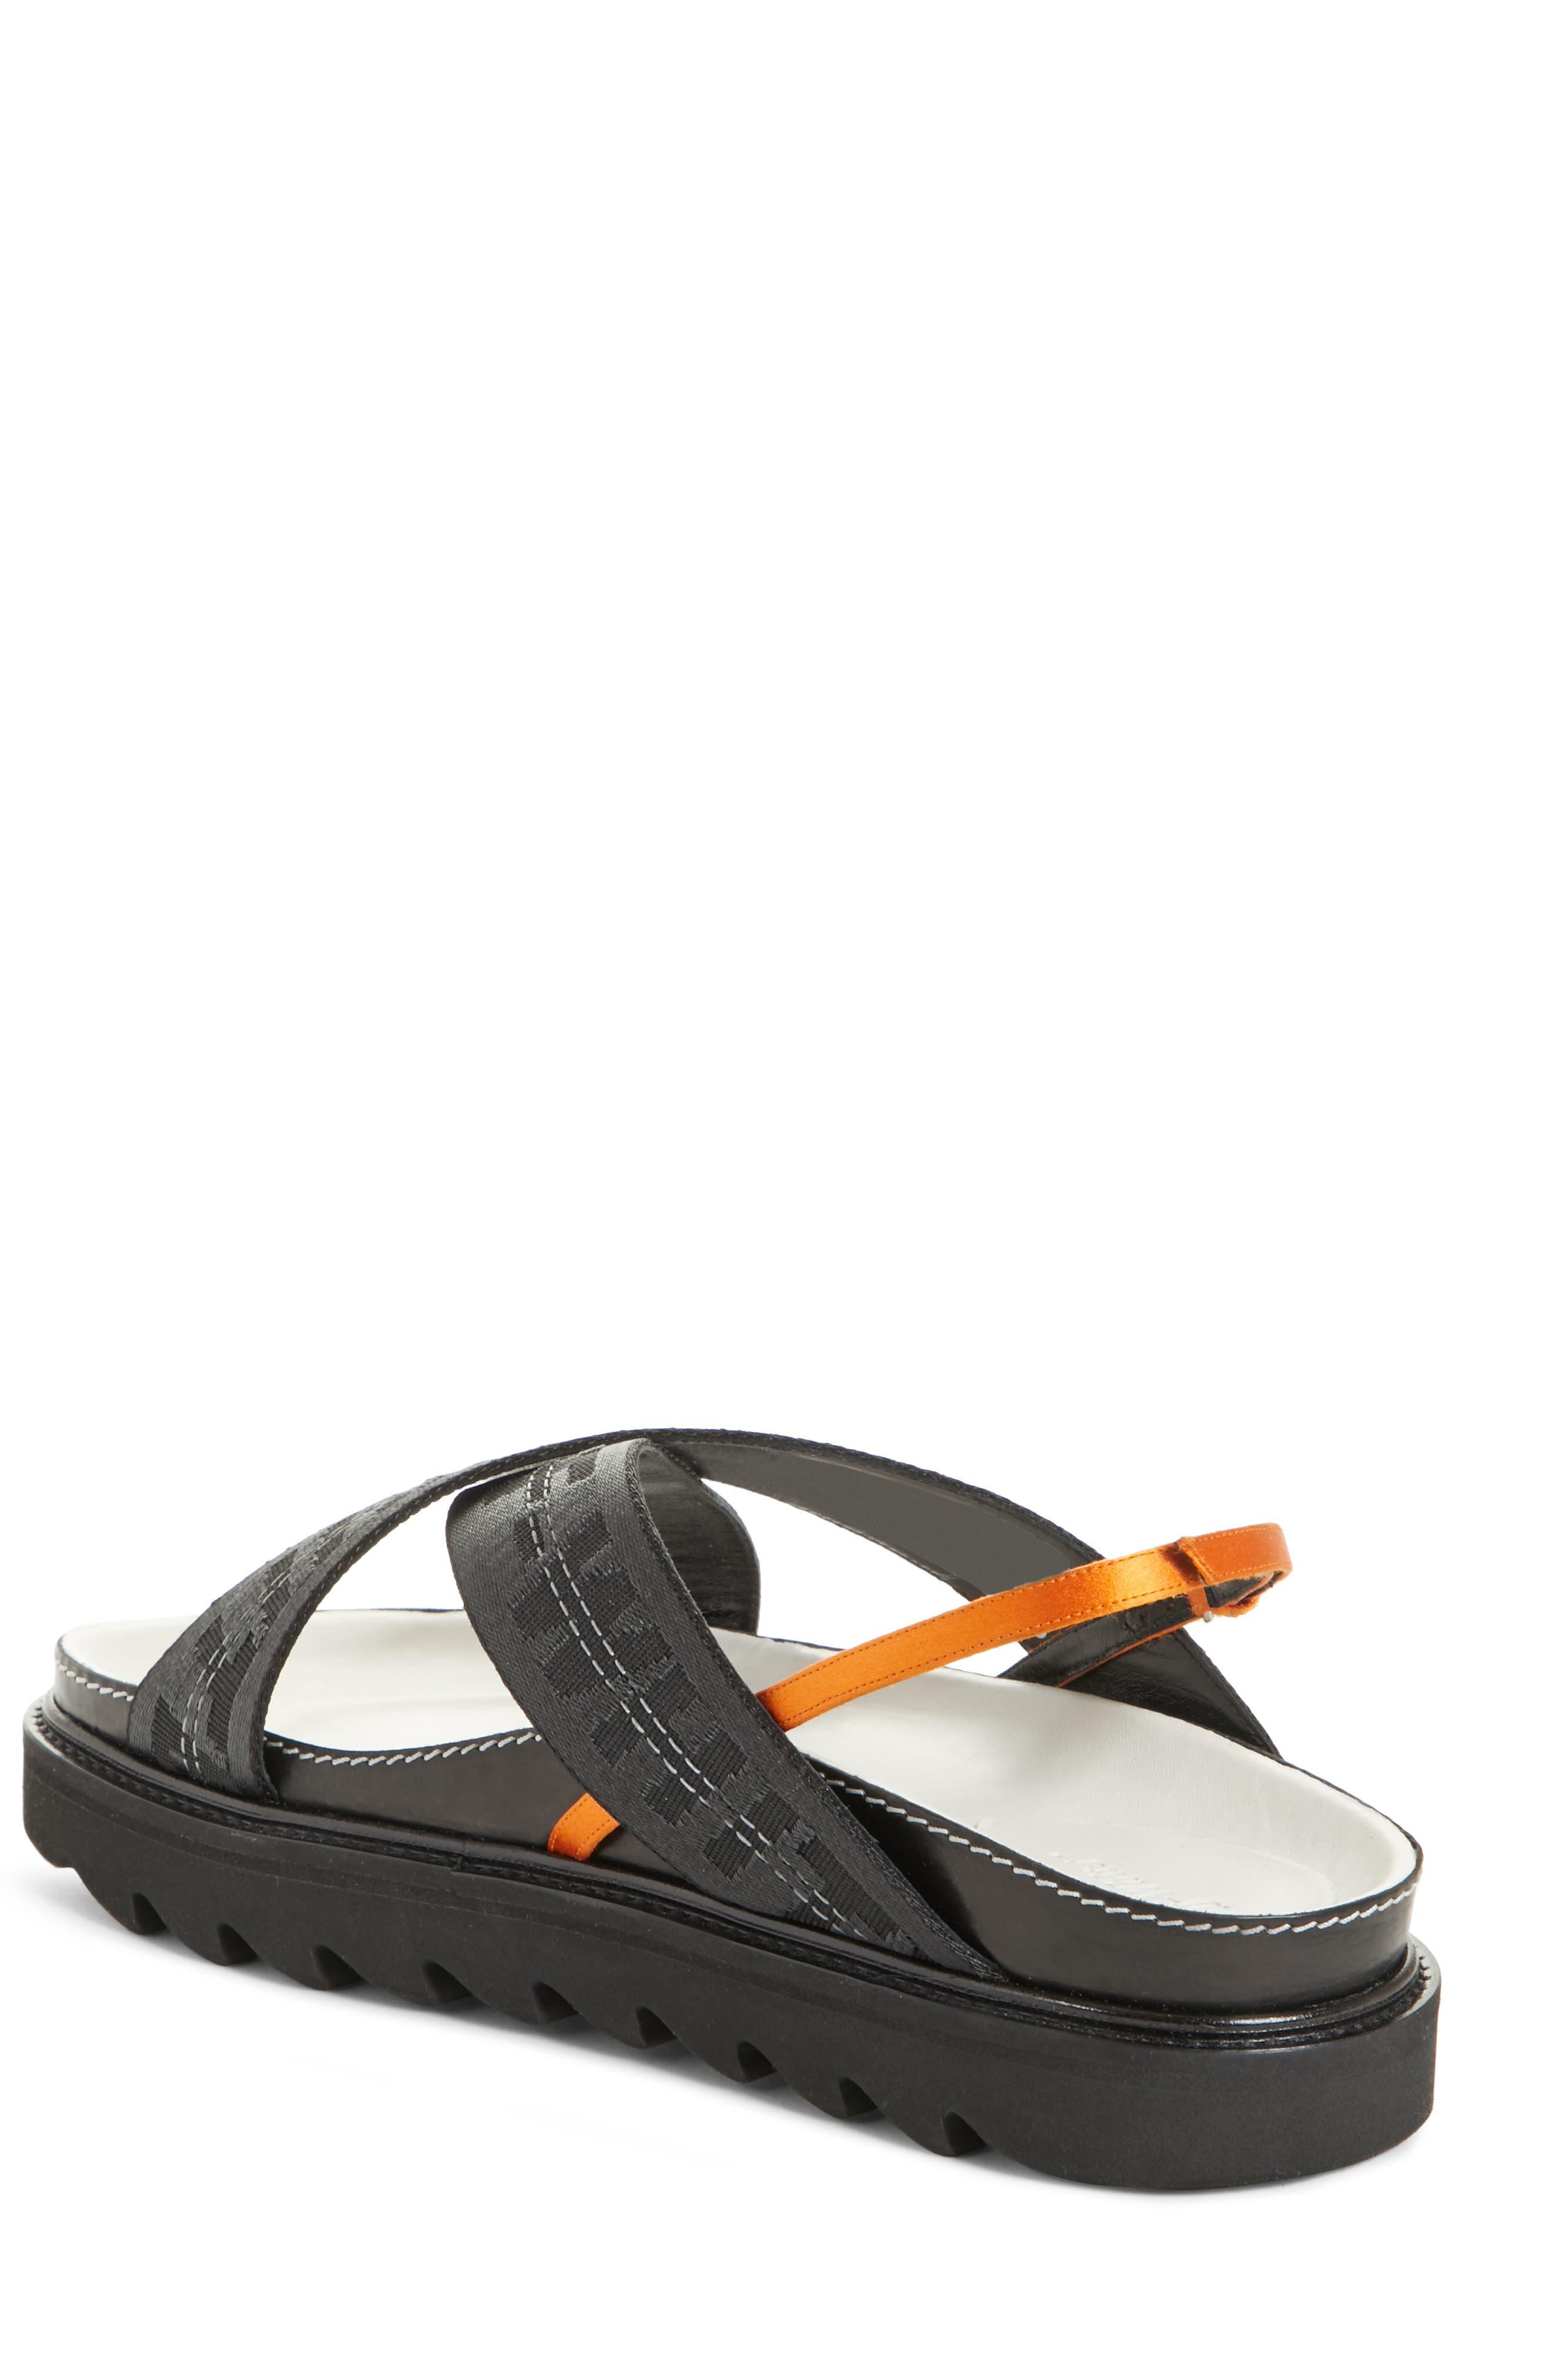 Industrial Belt Sandal,                             Alternate thumbnail 2, color,                             Black Black